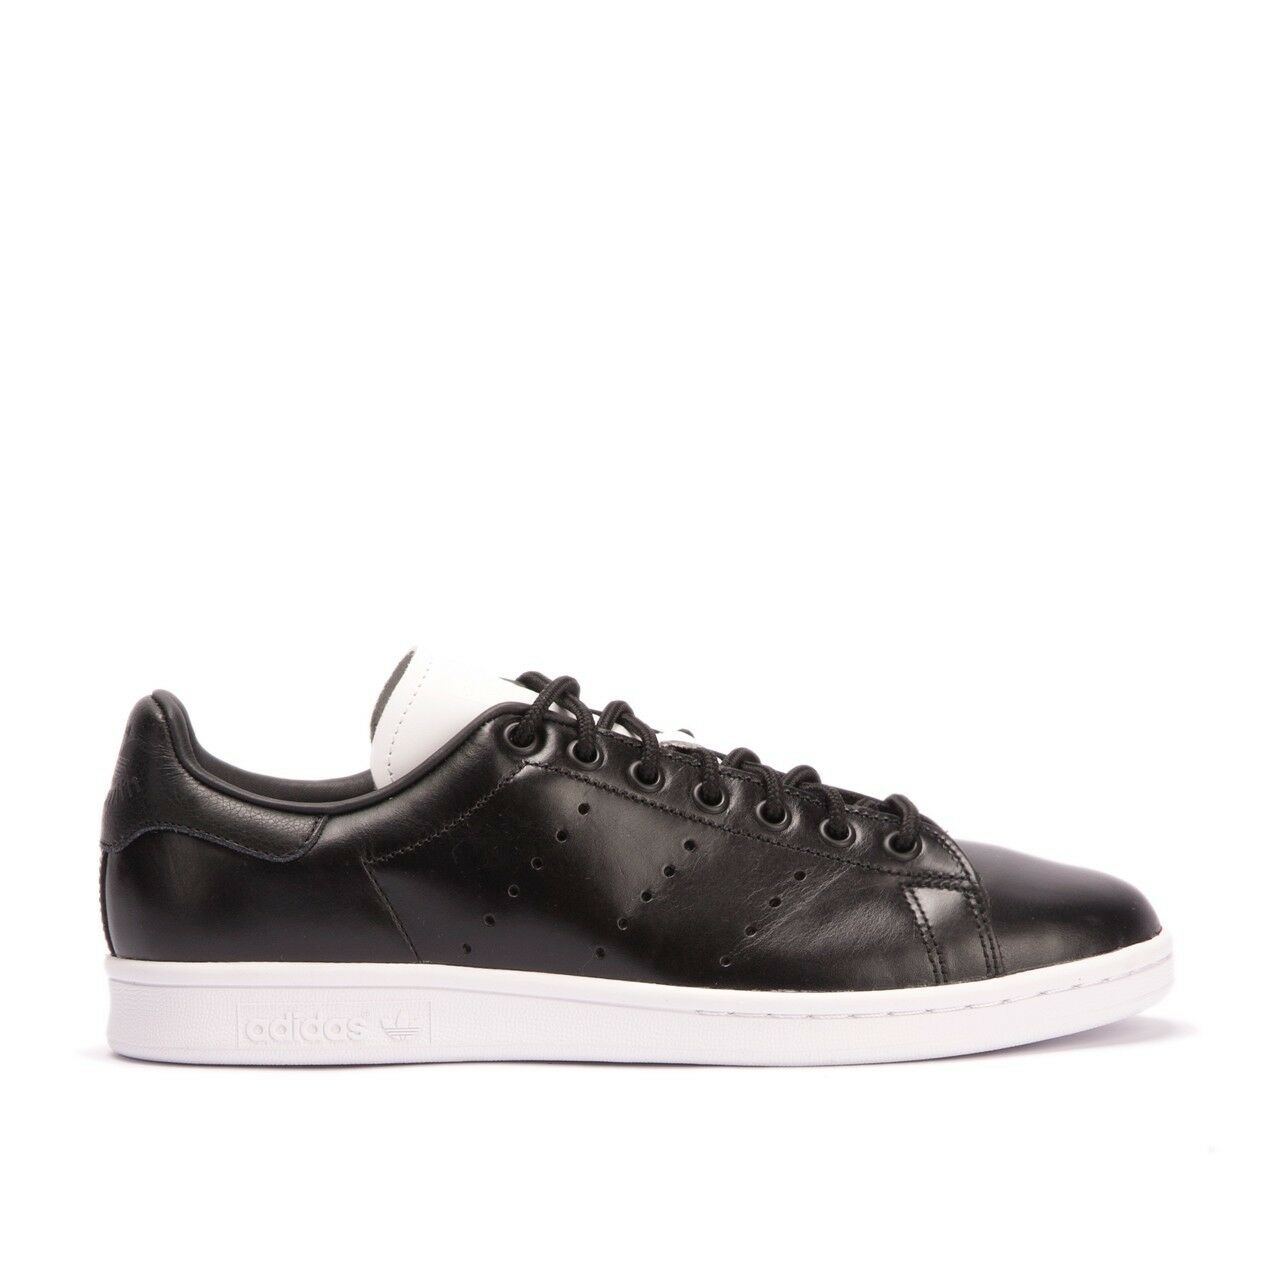 Adidas Adidas Adidas originali stan smith Uomo formatori skate shoes 8cade3